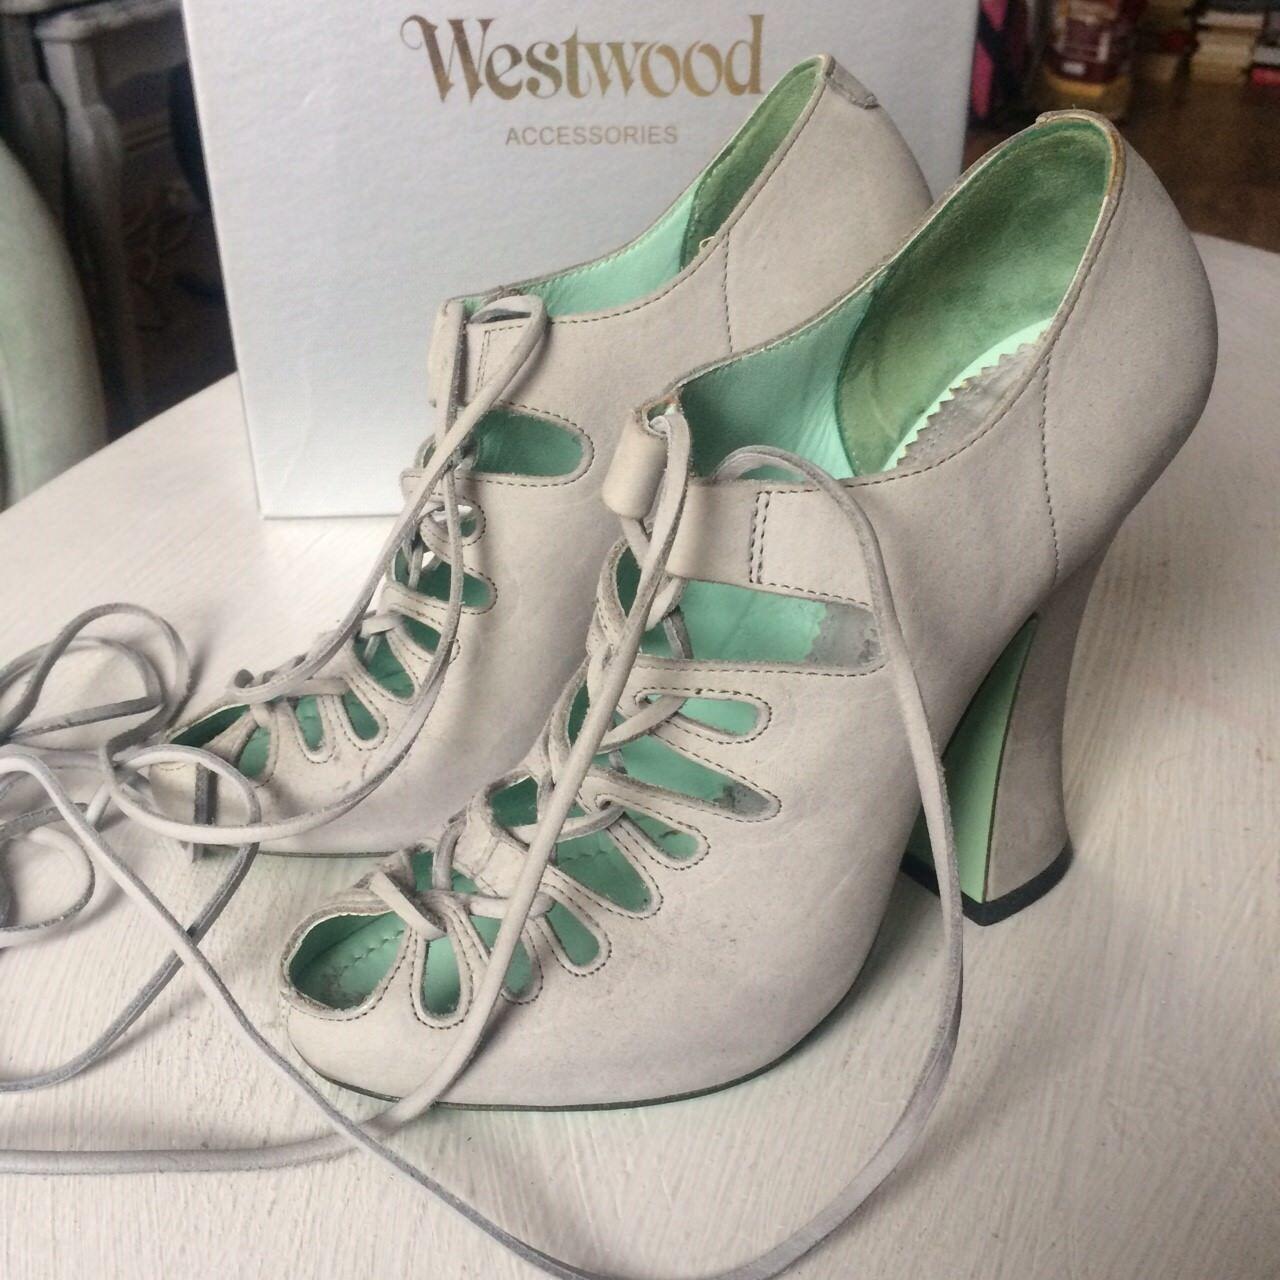 Vivienne westwood baroque cusnak grey shoes heels lace up UK5 rare